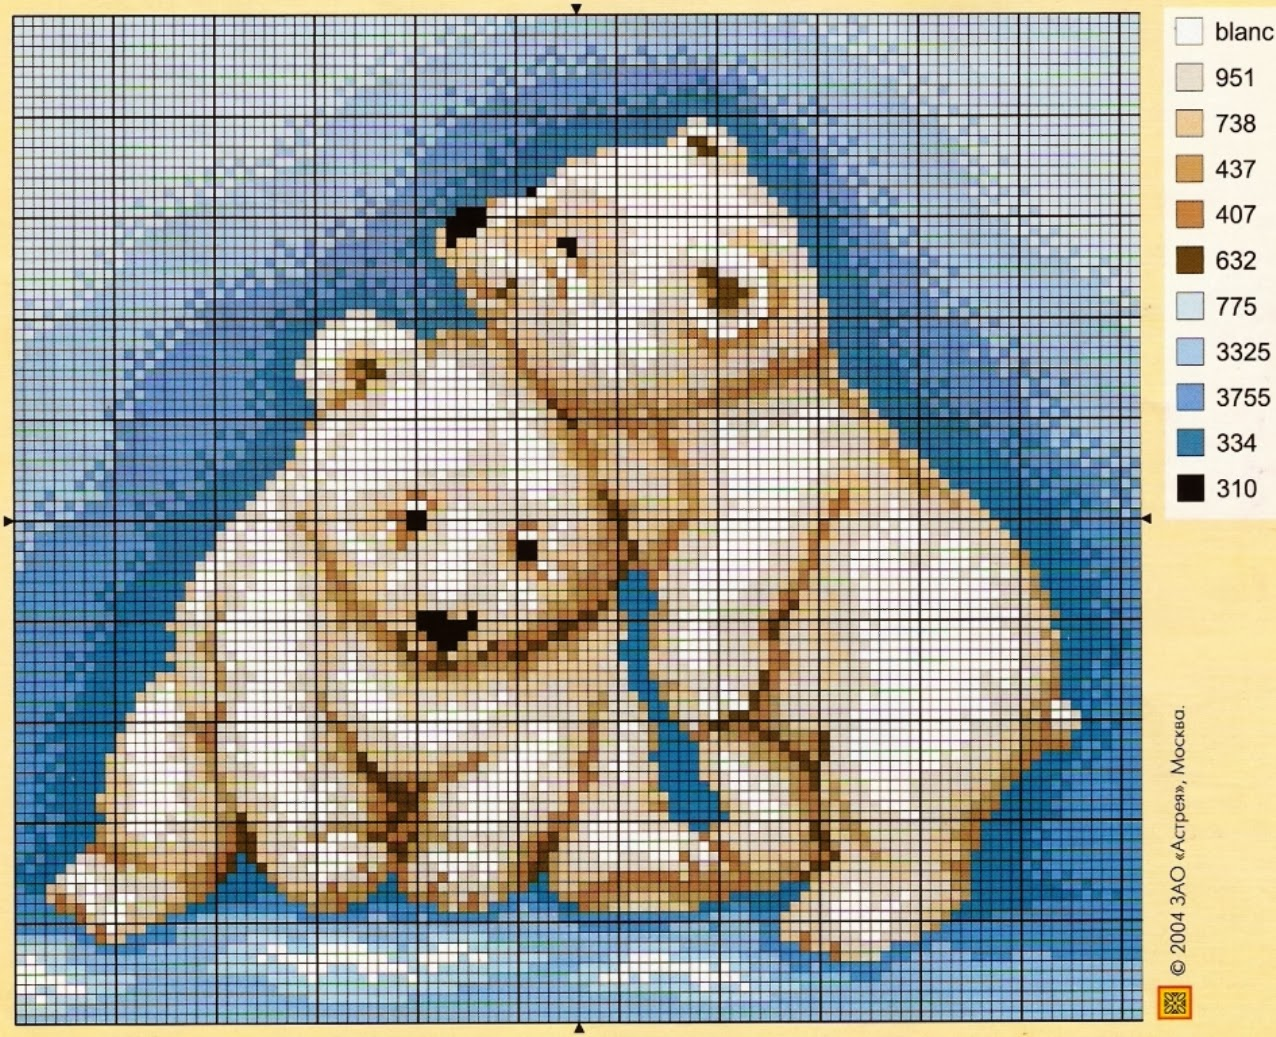 graficos de osos panda en punto de cruz Success